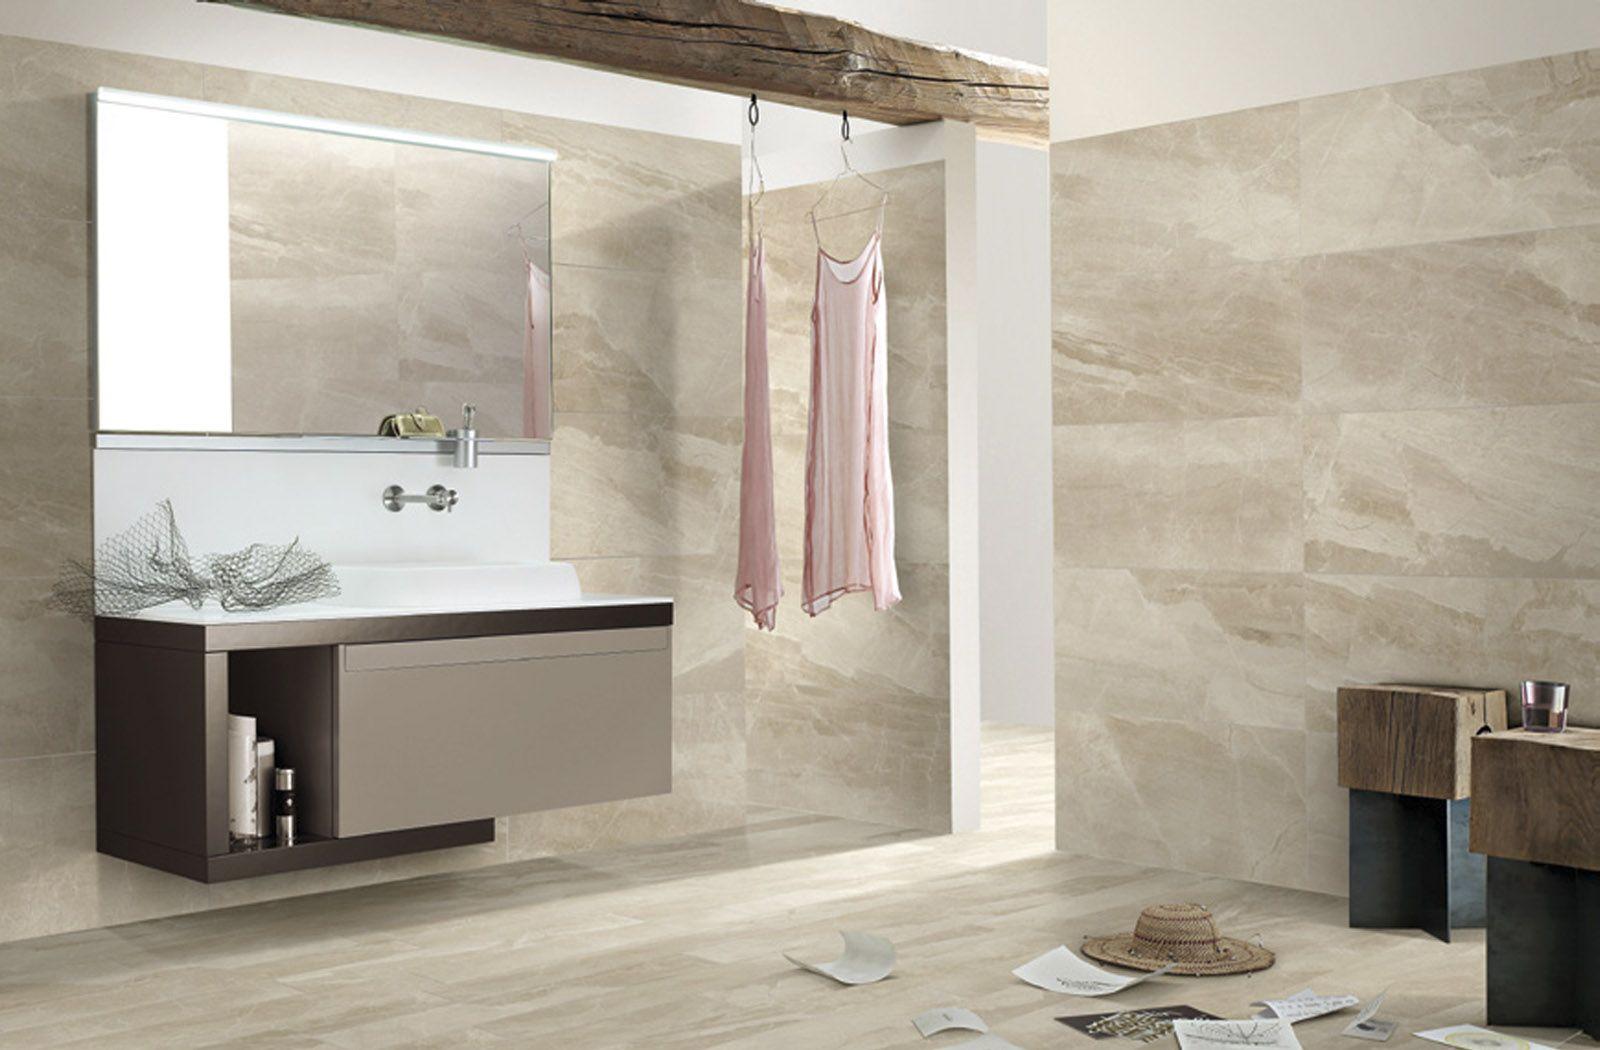 Queenslander Bathroom Designs luxurious modern resort bathroom decor. tile from mainstone